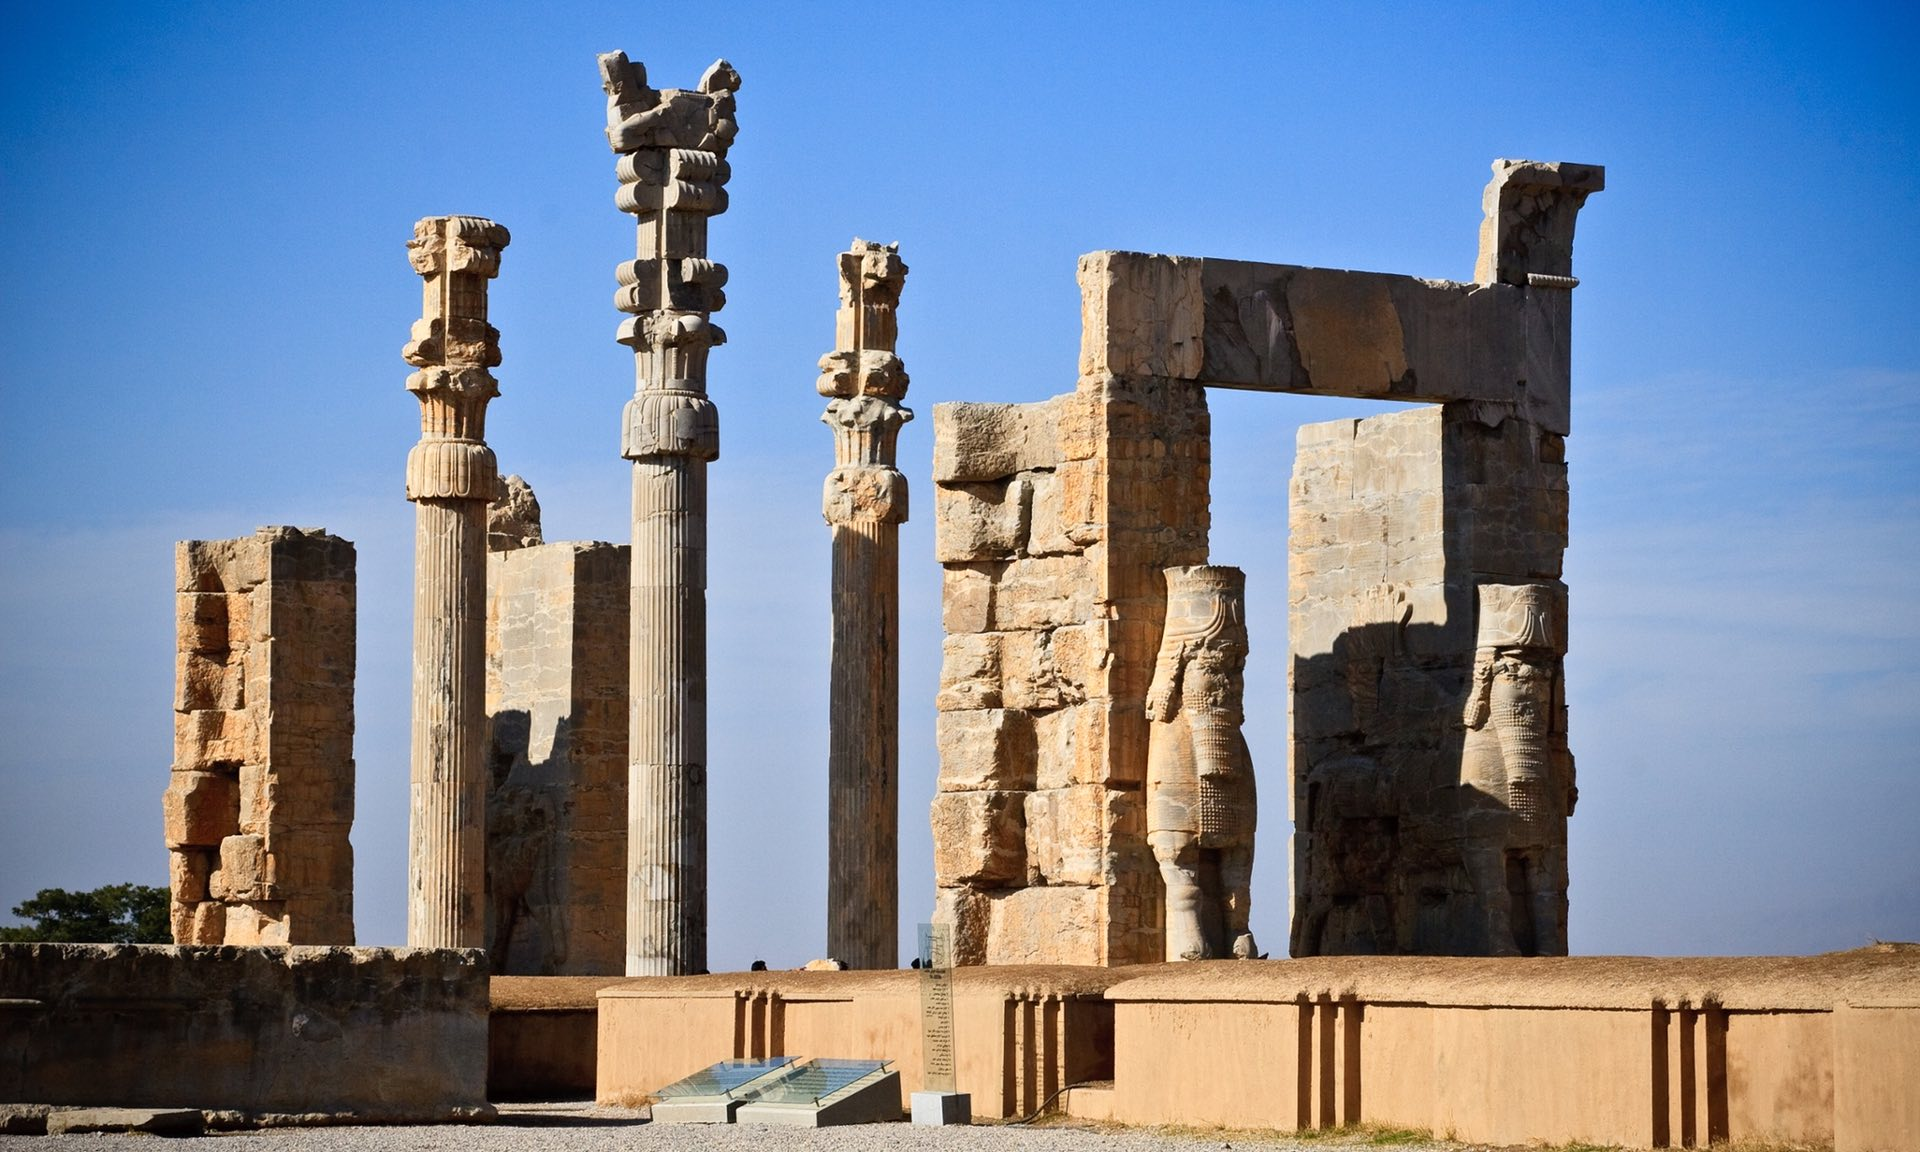 10 ideas for adventurous holidays in Iran